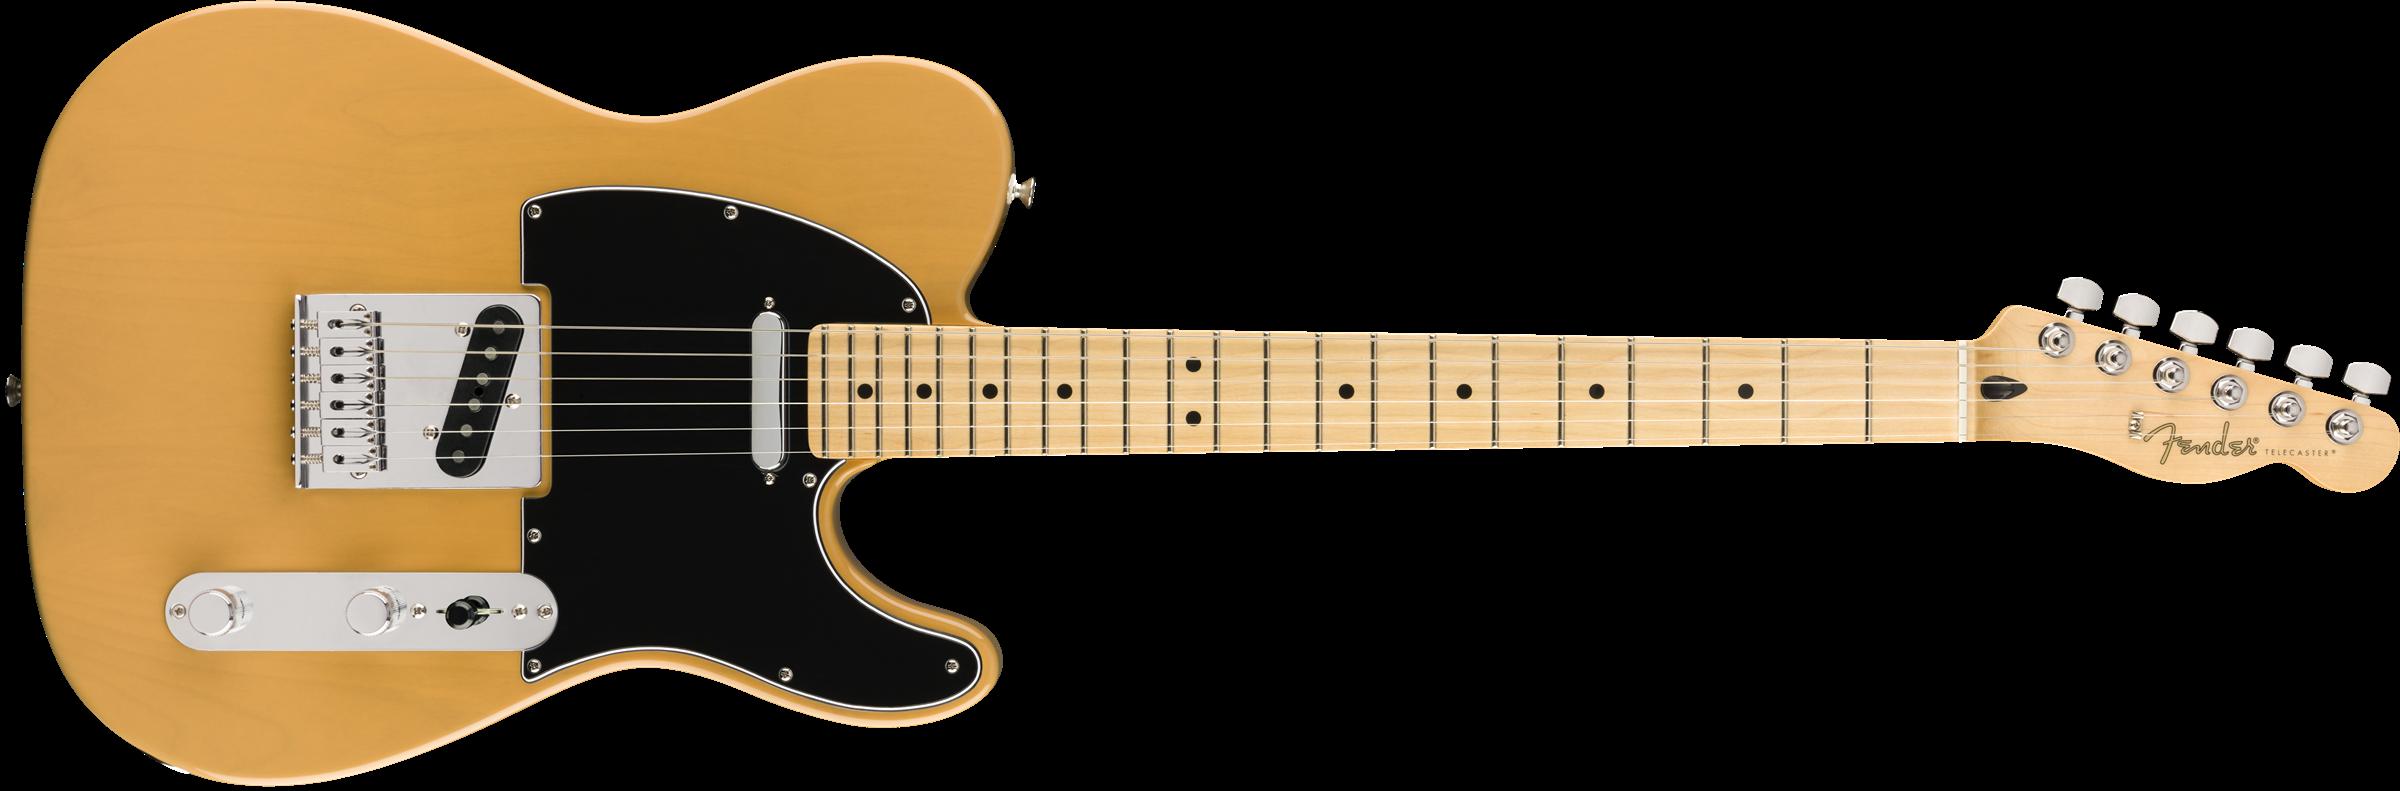 FENDER-Limited-Edition-Player-Telecaster-Maple-Fingerboard-Butterscotch-Blonde-sku-571003981